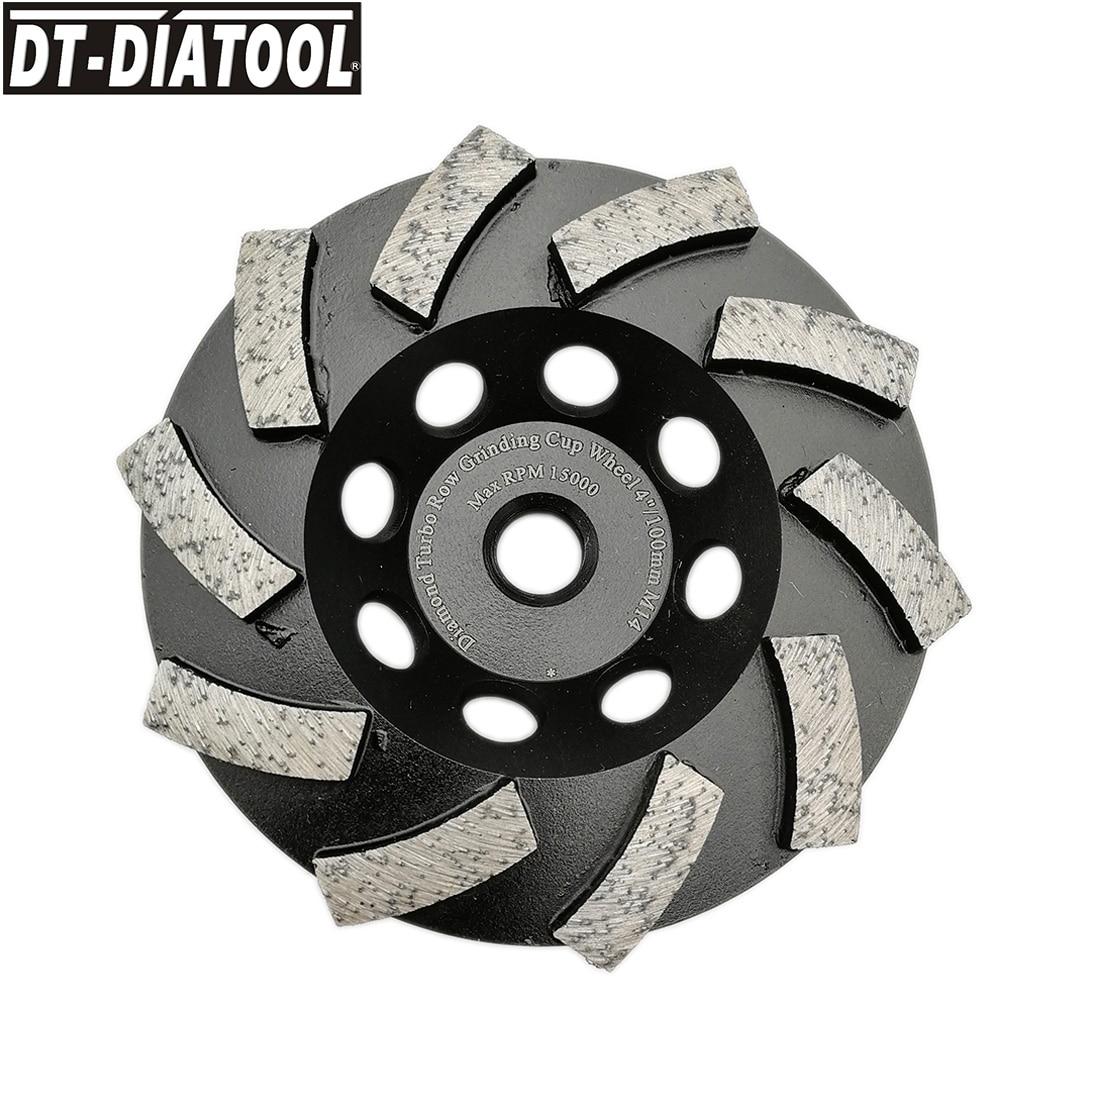 DT-DIATOOL Dia 100mm/4inch M14 Thread Diamond Segmented Turbo Row Cup Grinding Cup Wheel Granite Marble Concrete Diamond Wheel